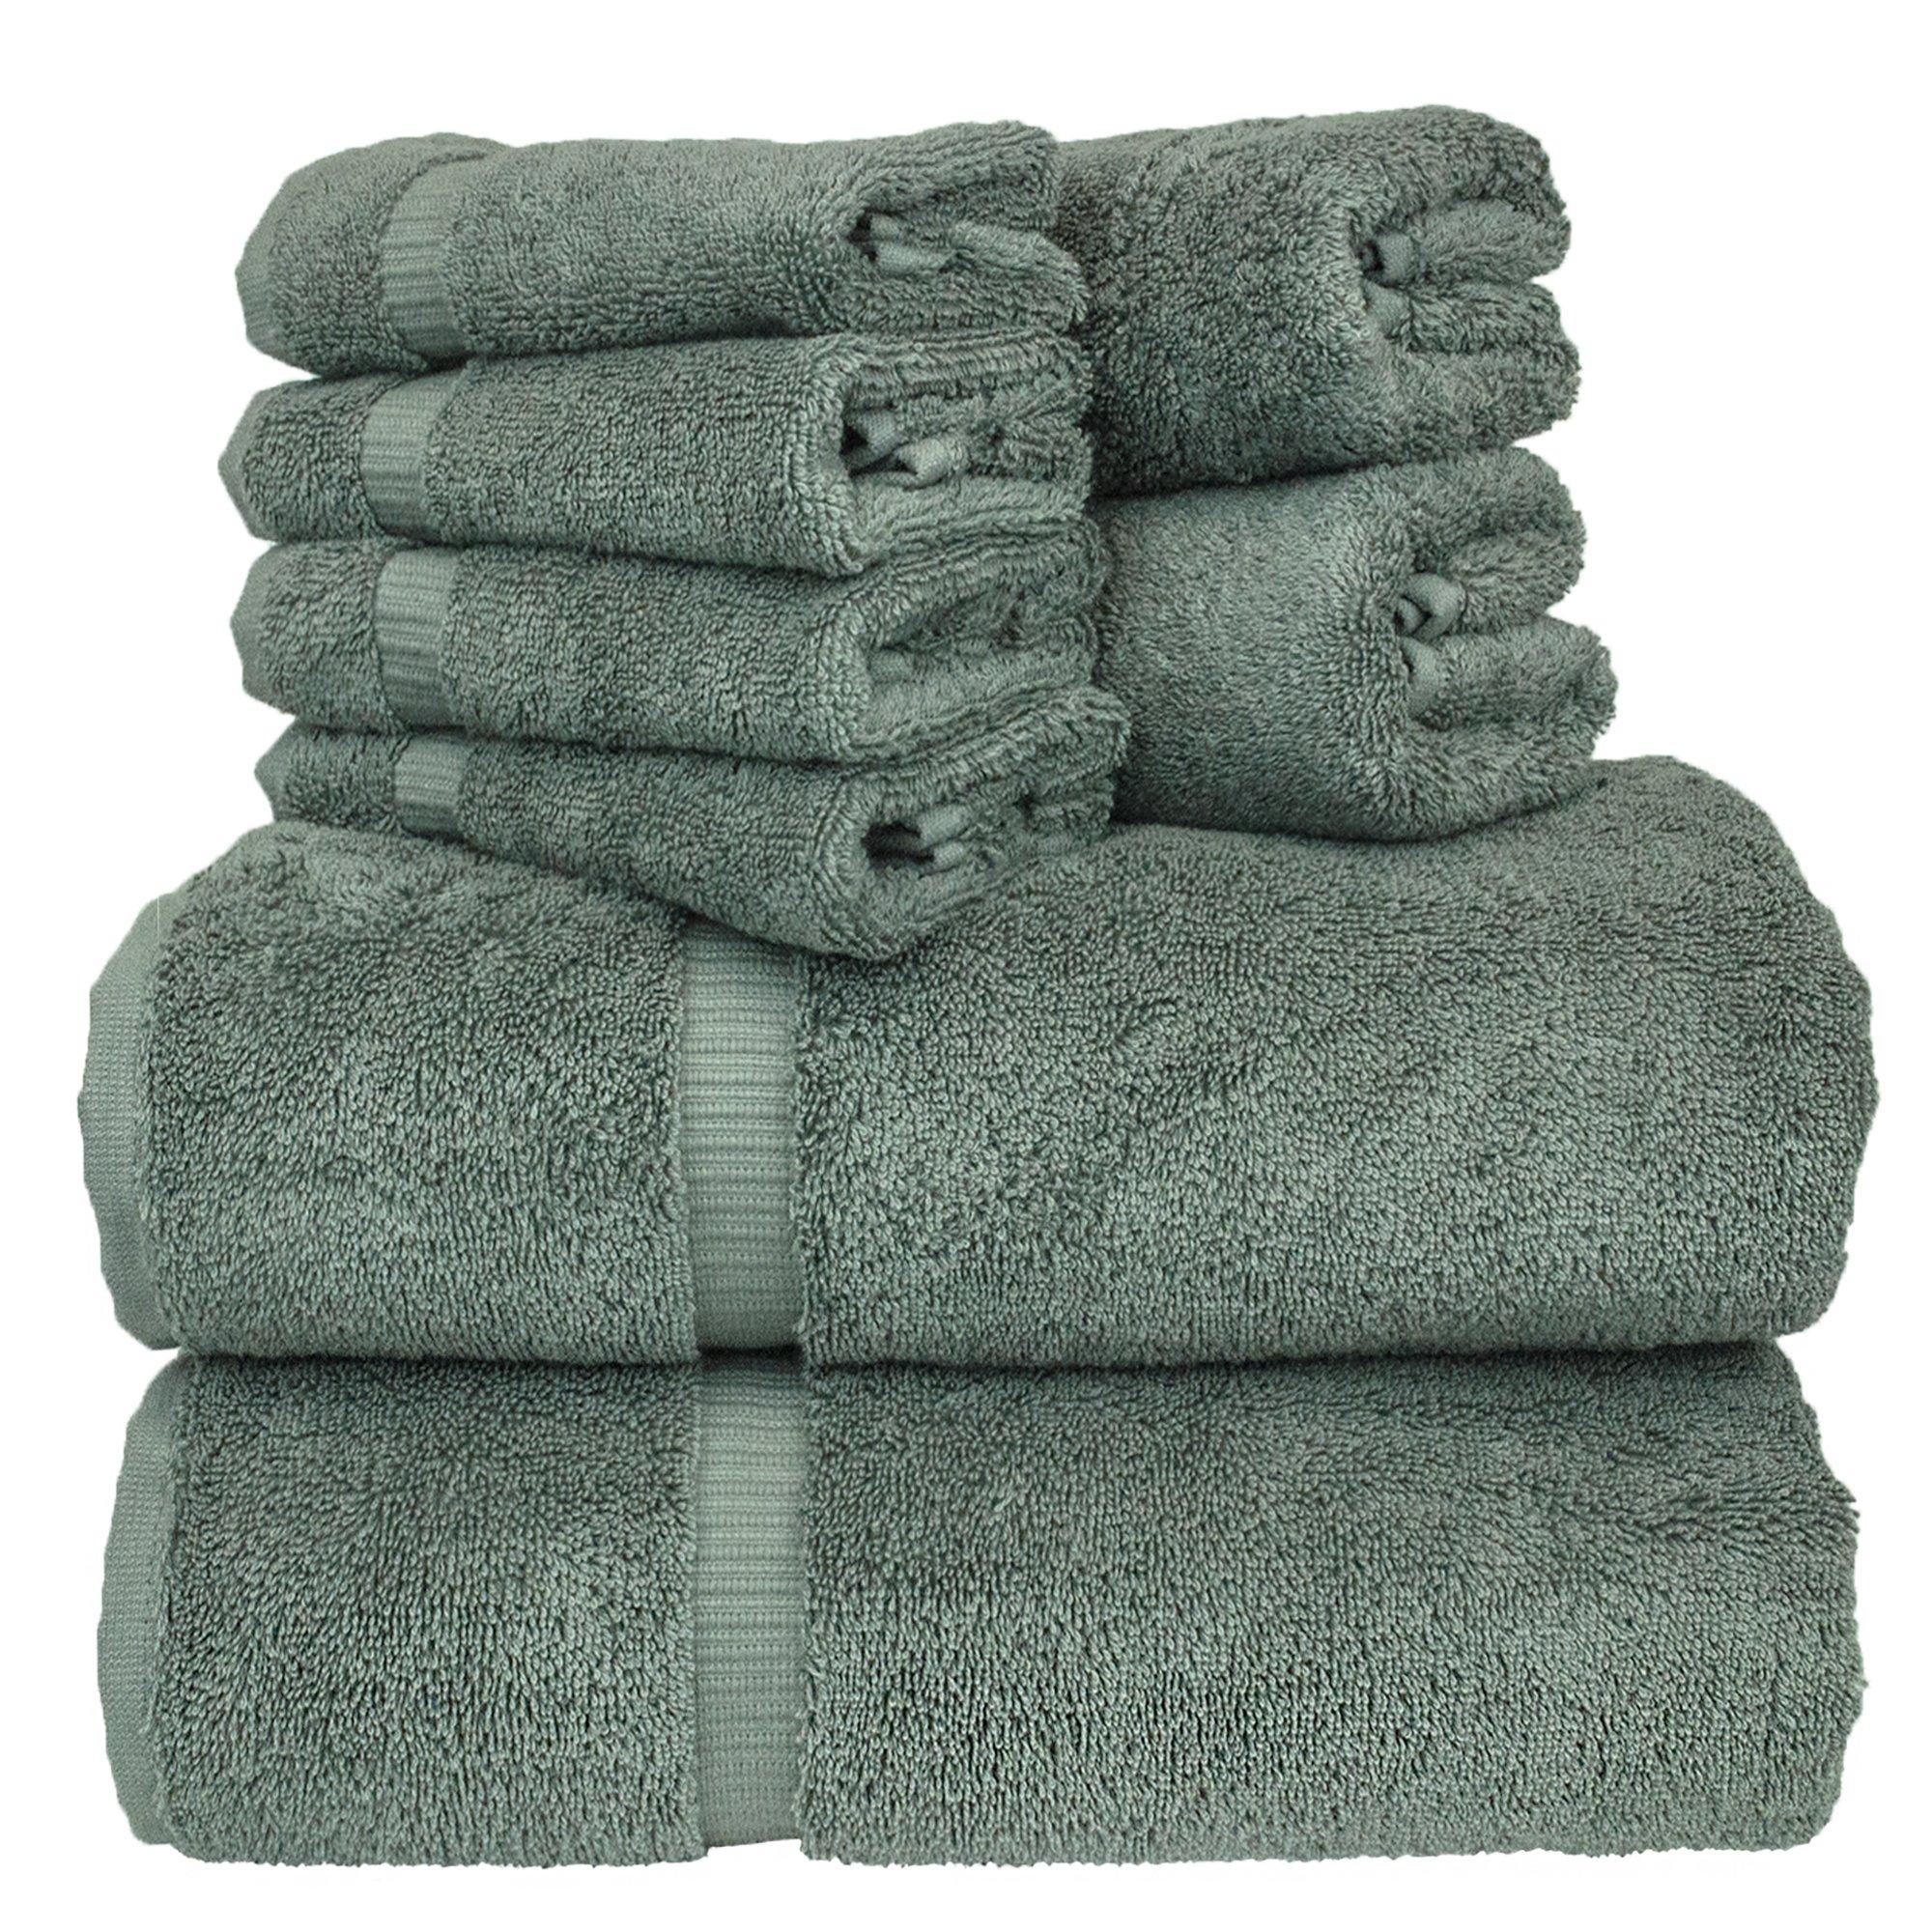 Luxury Hotel & Spa Bath Towel Set Turkish Cotton Towel Bundle Total 8-Piece Set, 2 Bath Towel 27''X54'', 2 Hand Towel 16''X30'', 4 Washcloth 13''x13'', Set of 8 (Gray)